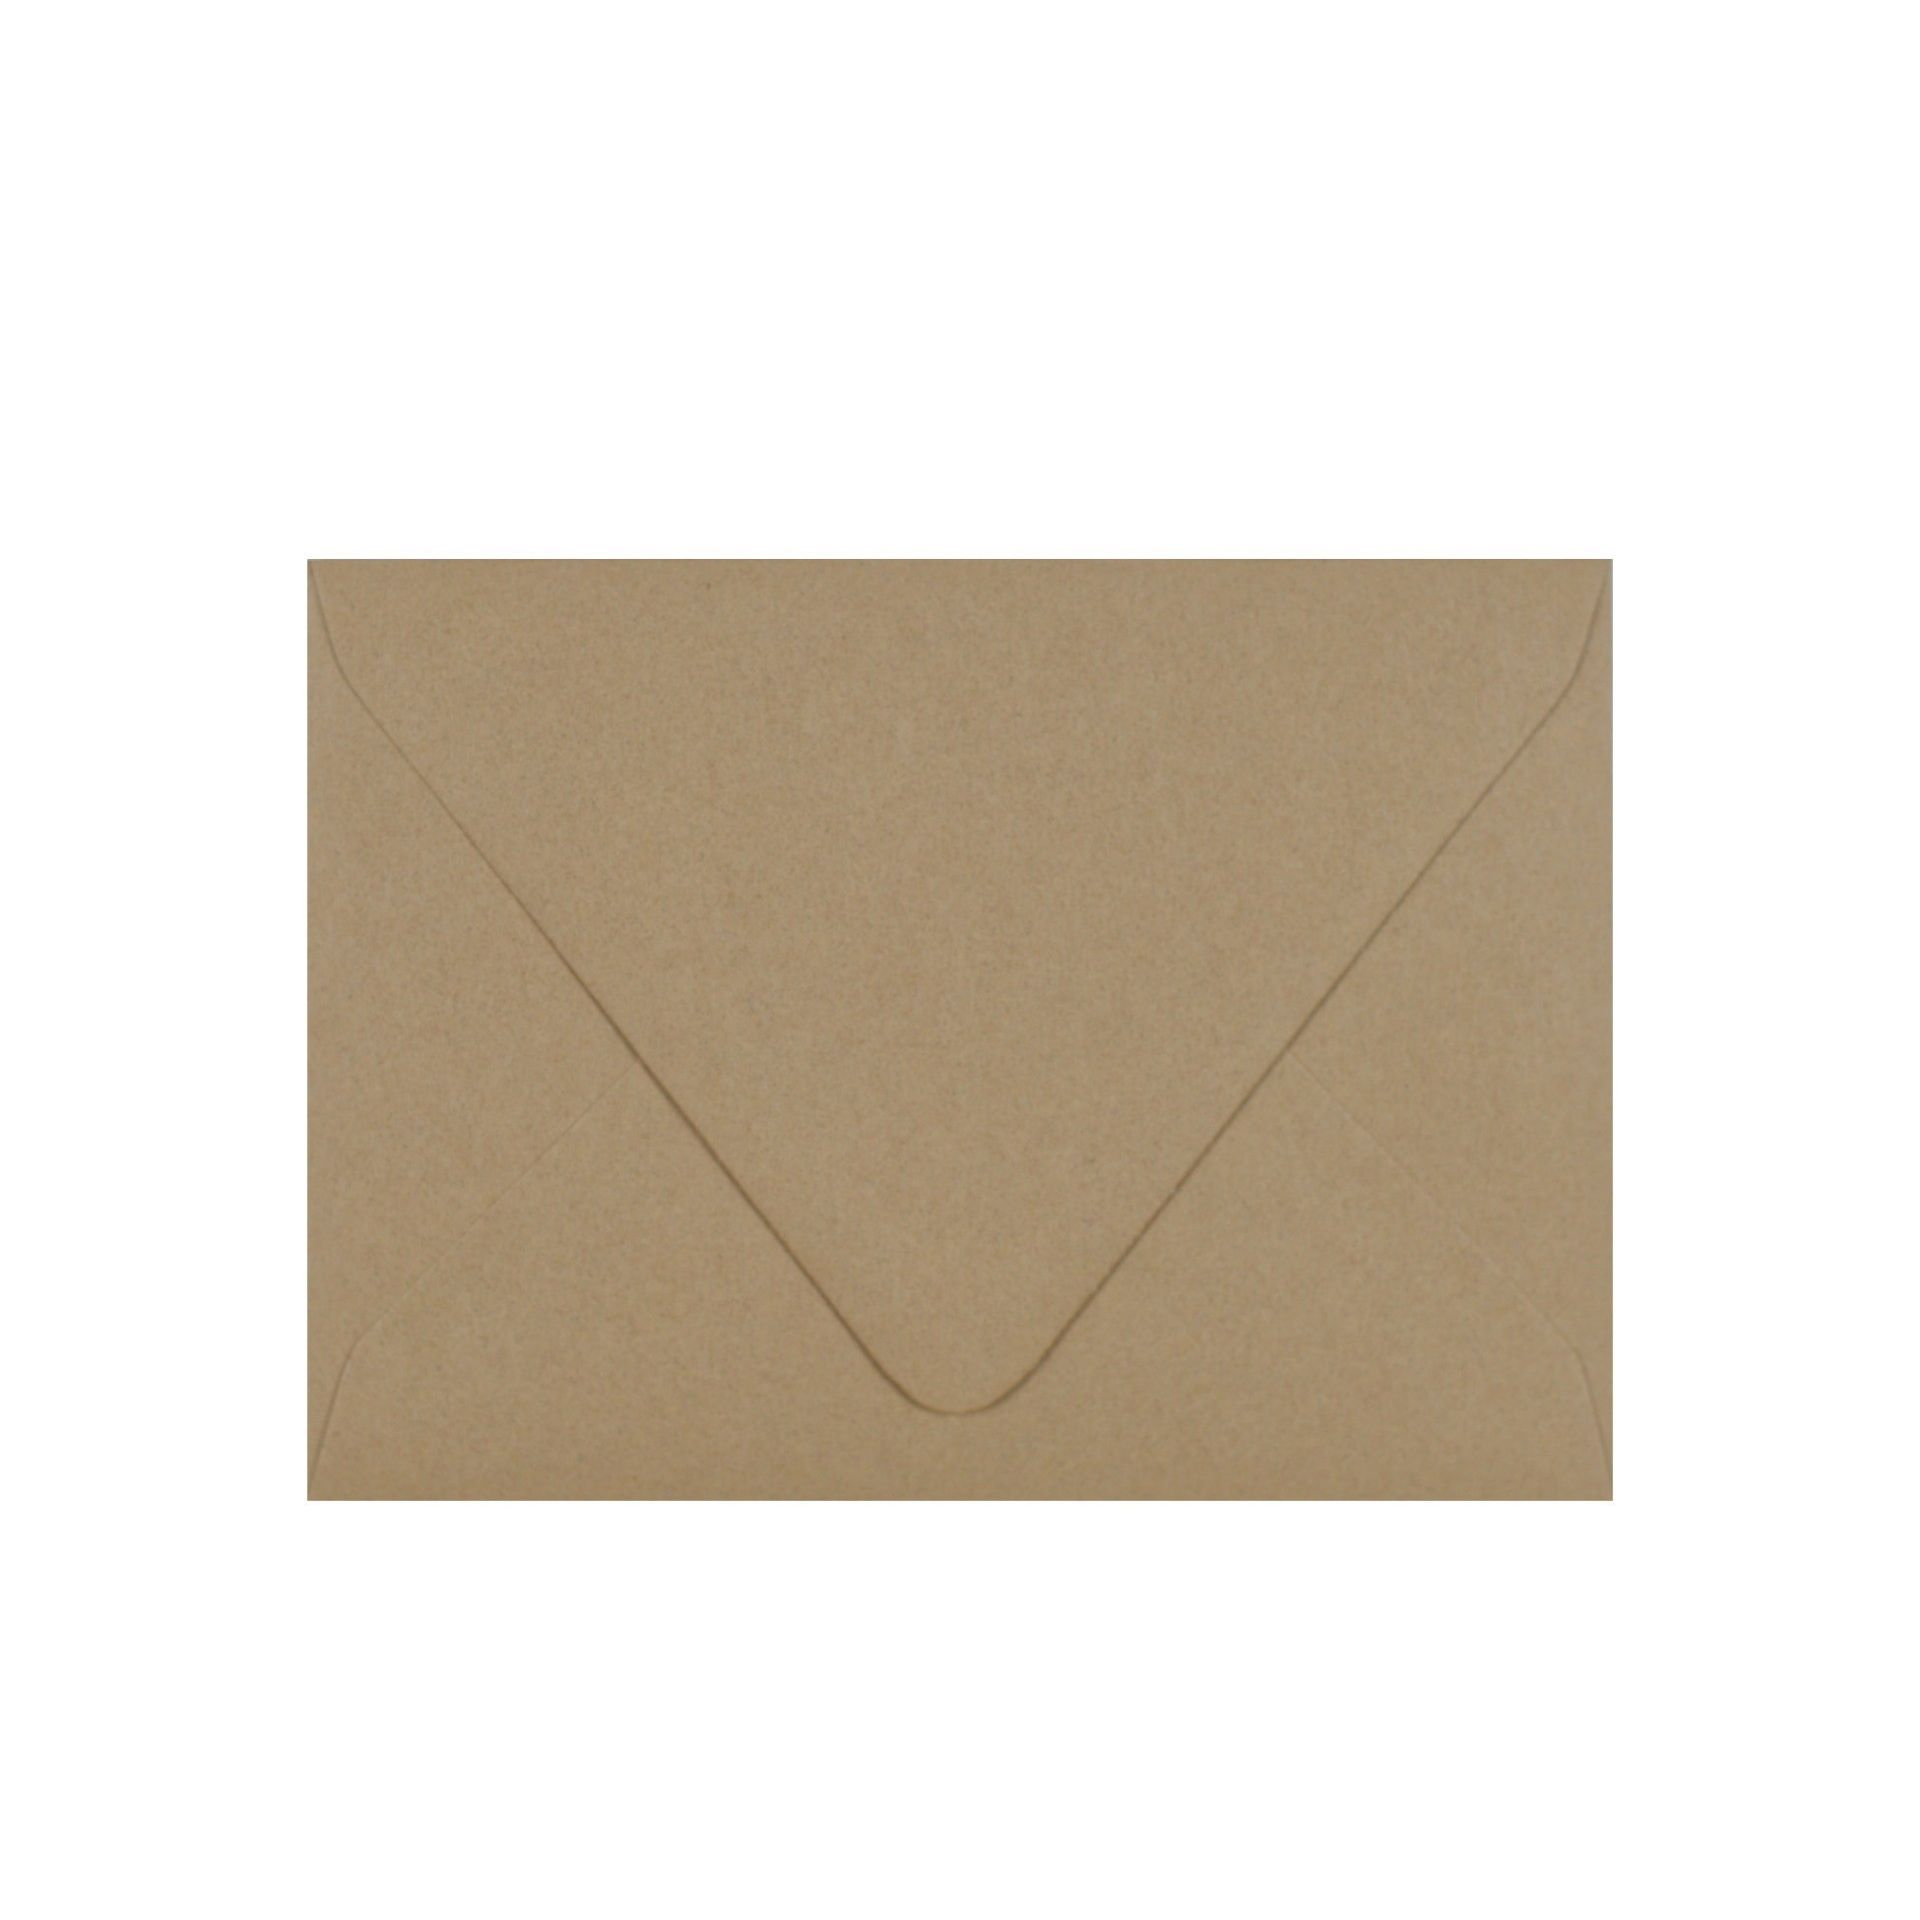 af1a0909c68b Light Rustic Kraft - A7 Euro Flap Envelopes 32 81lb Text (120gsm) - 25 PK